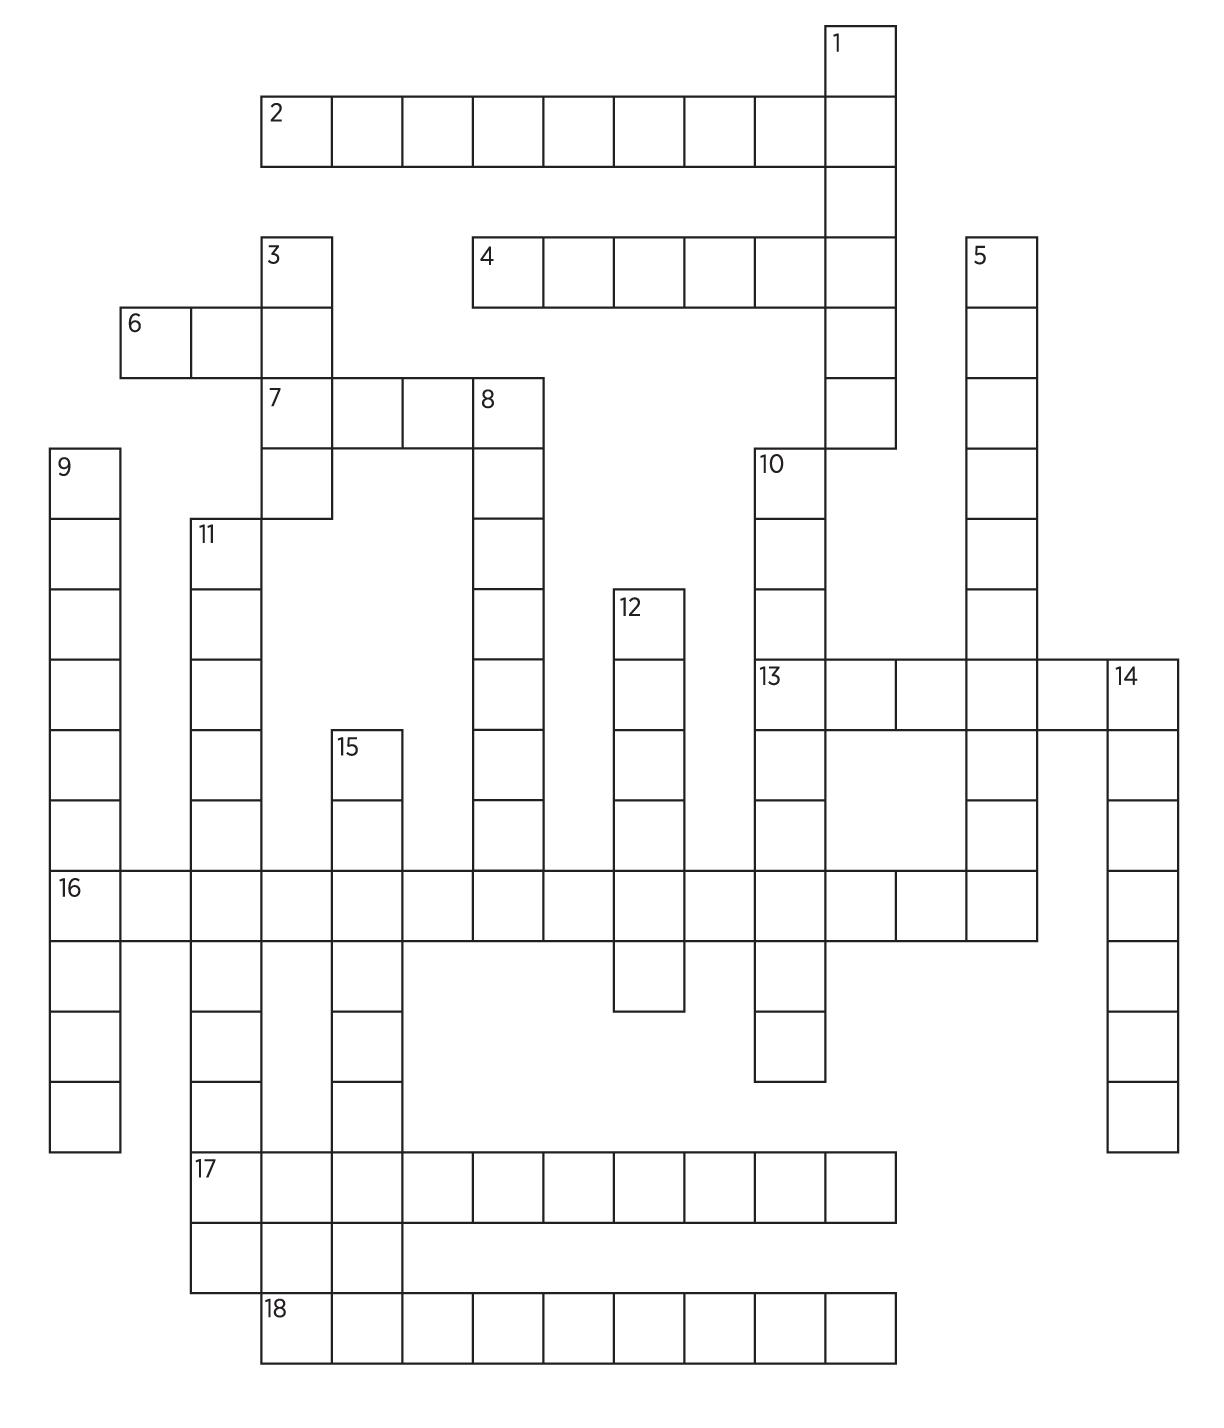 2020 Audubon Holiday Crossword Clues Audubon